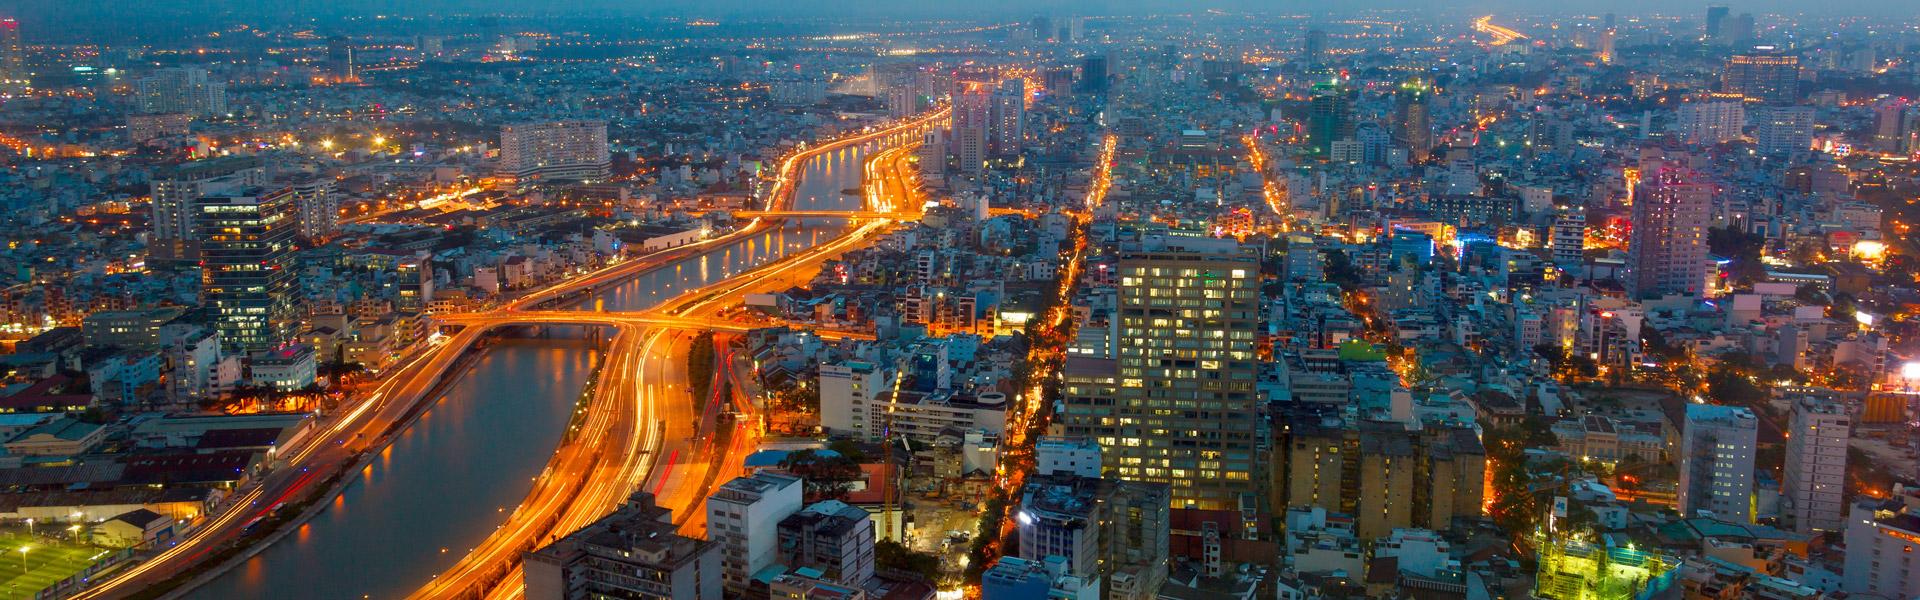 48 Hours in Saigon | Wendy Wu Tours Blog